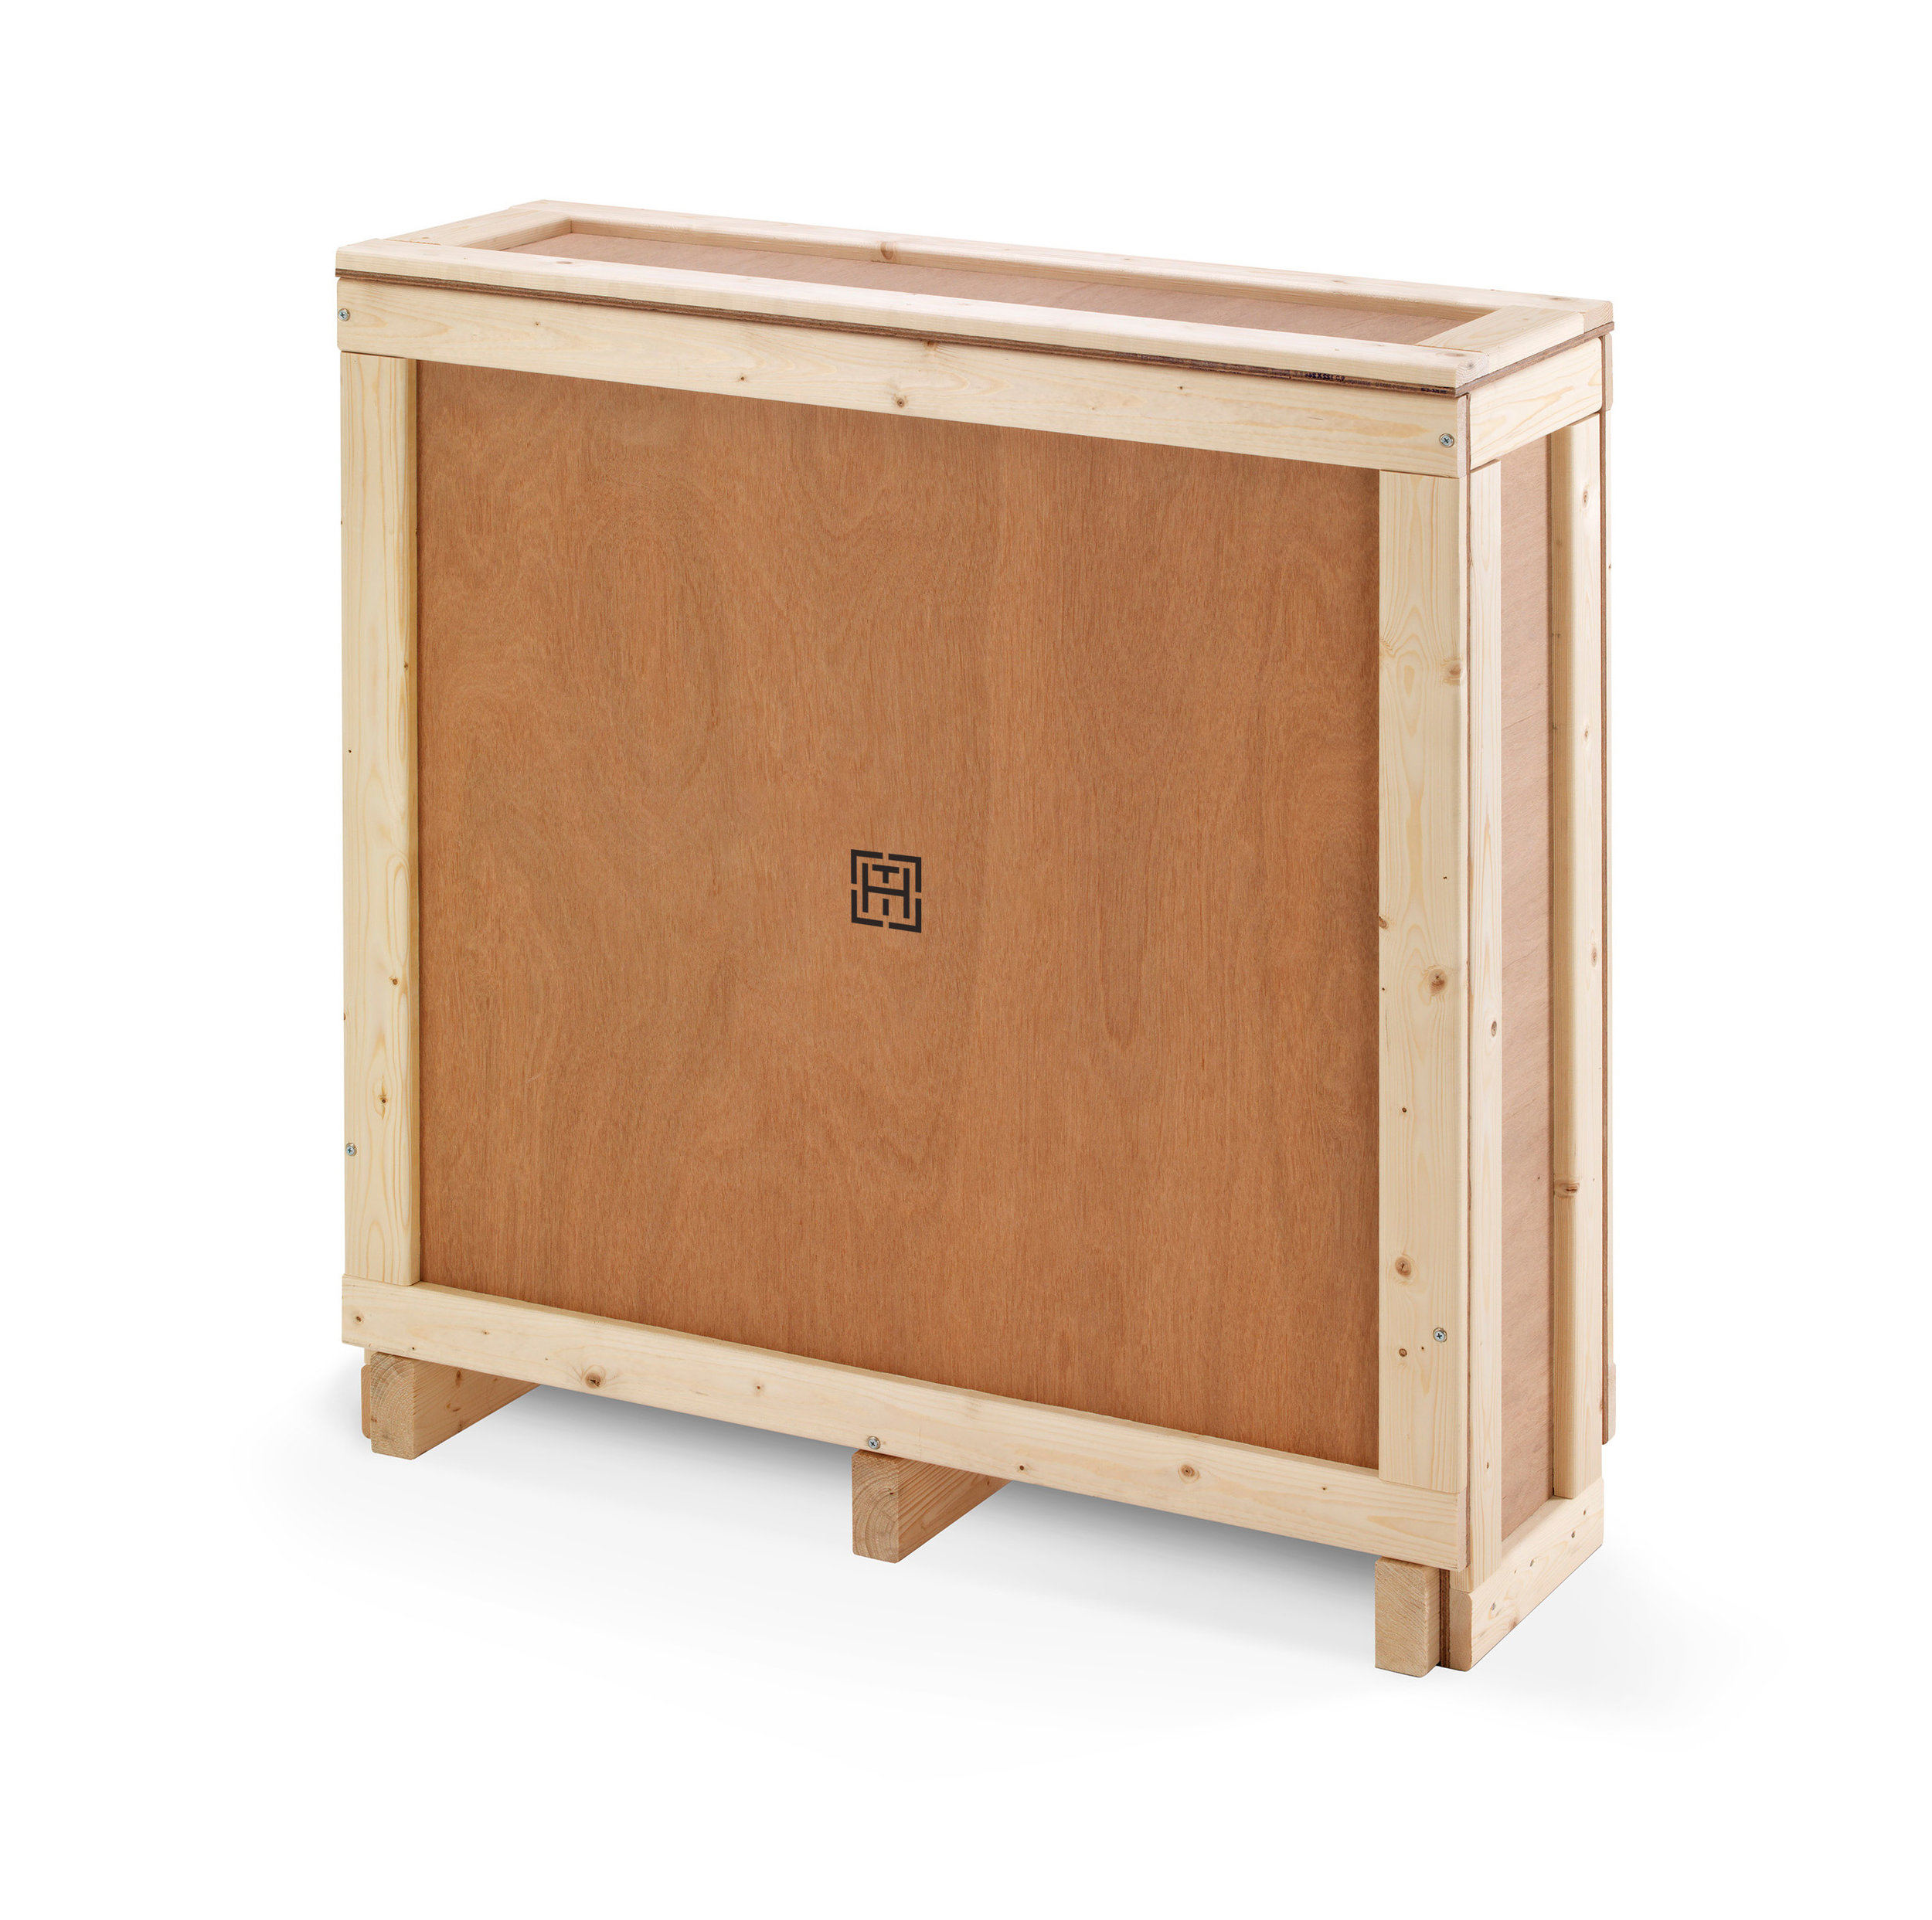 Hang Tough Shipping Crate